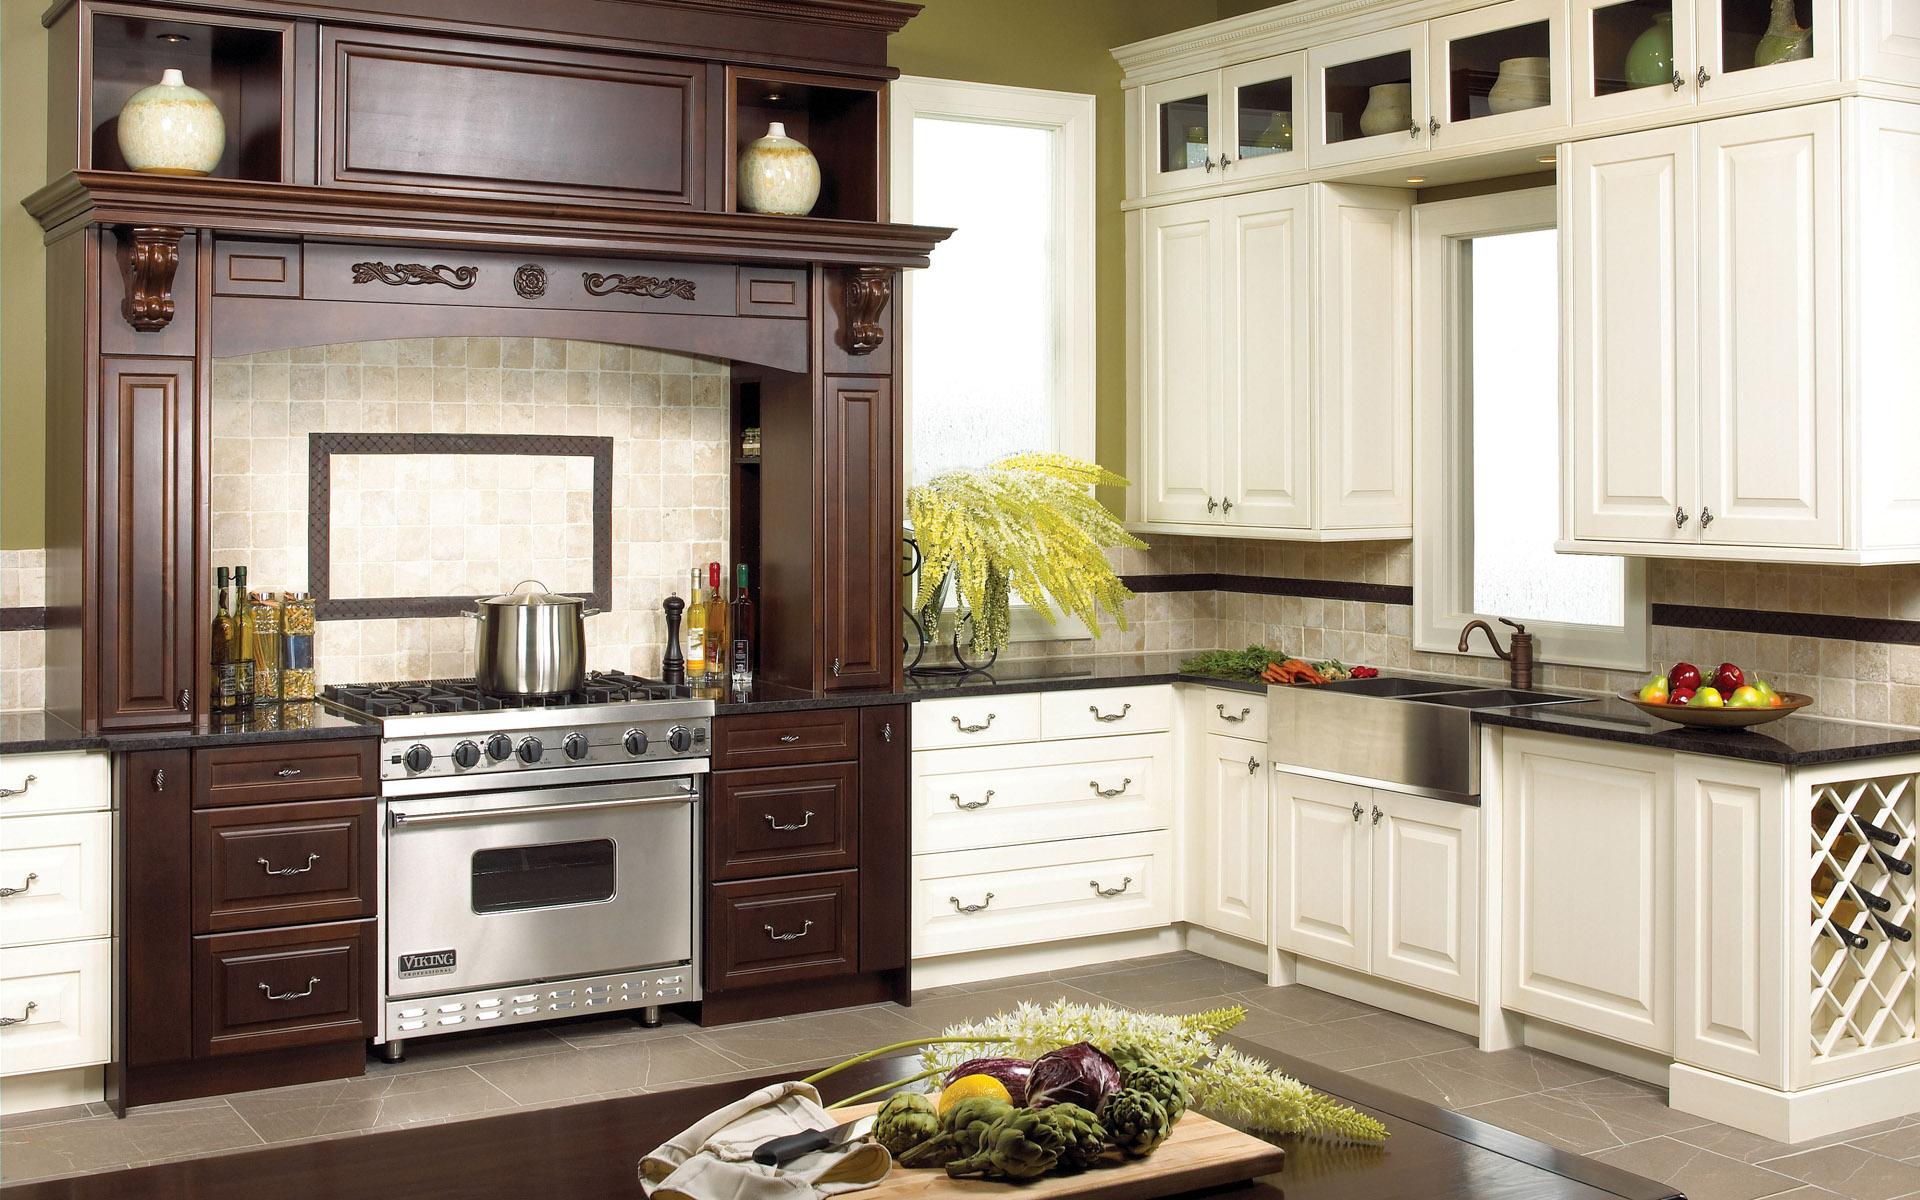 luxurious-Kitchen_interior-design luxurious Kitchen interior design